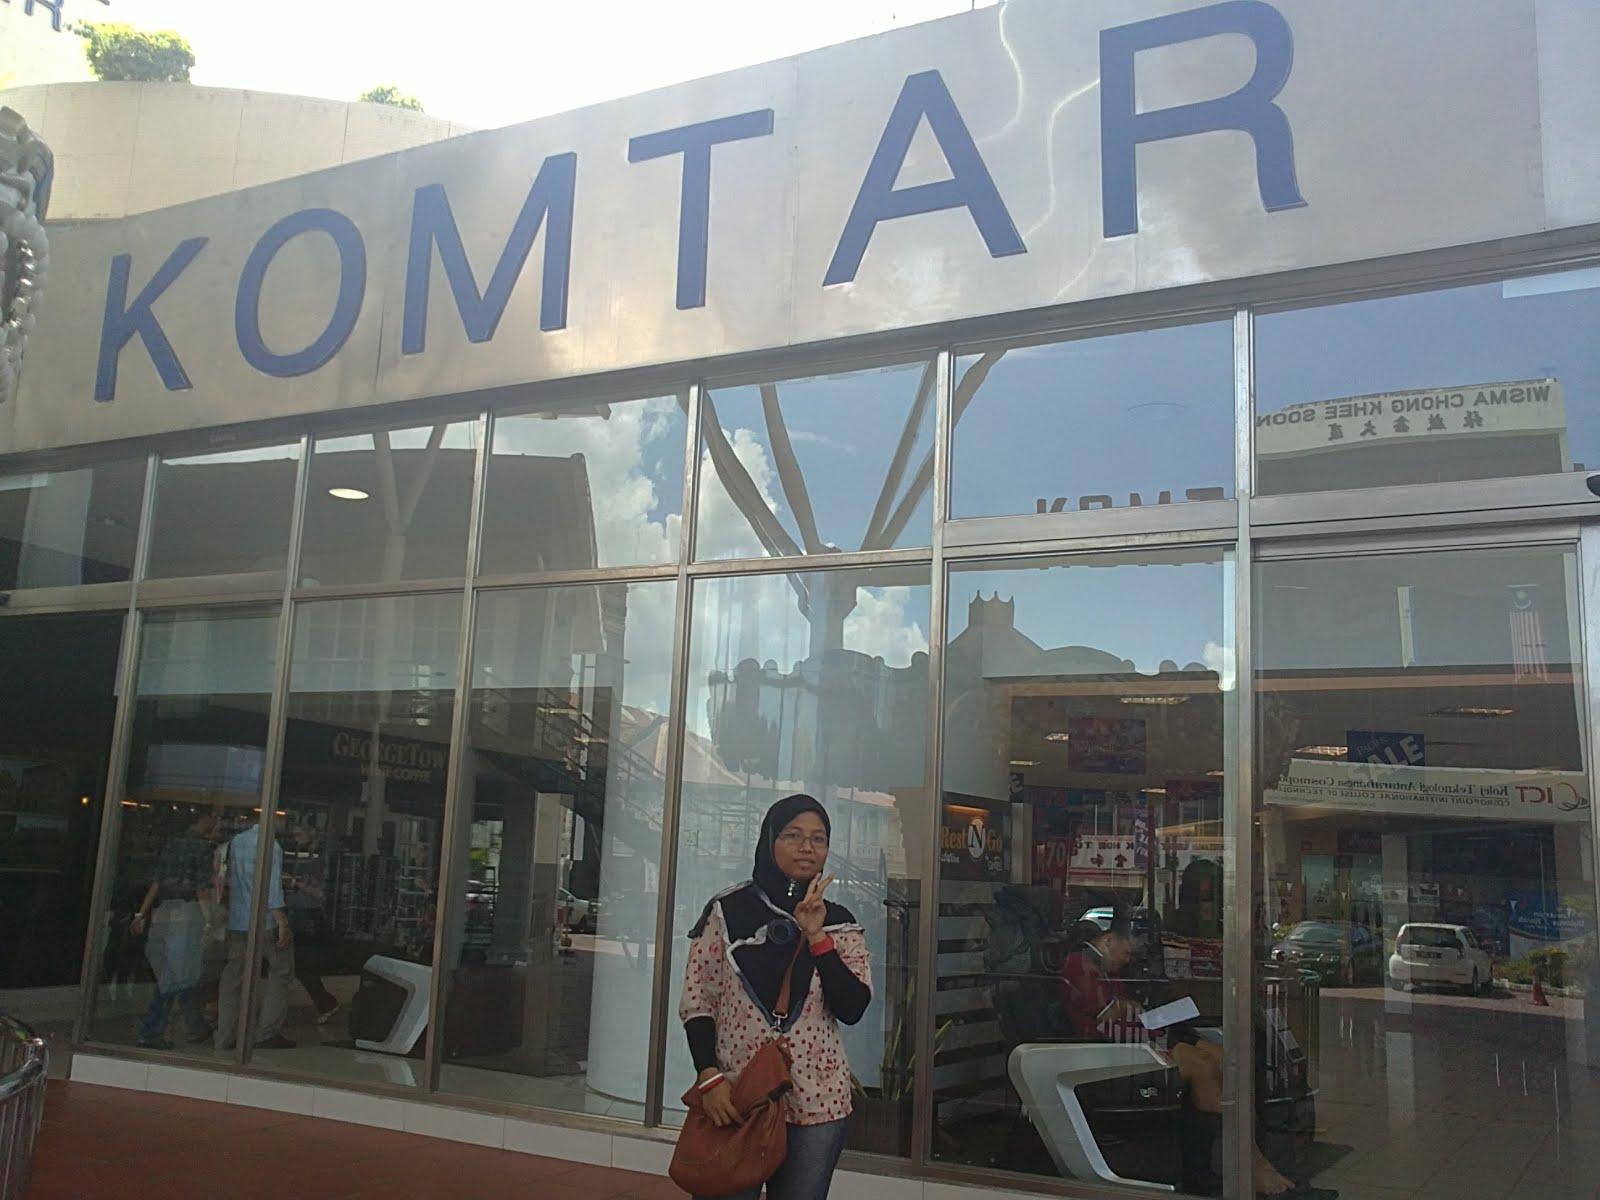 KOMTAR, Penang